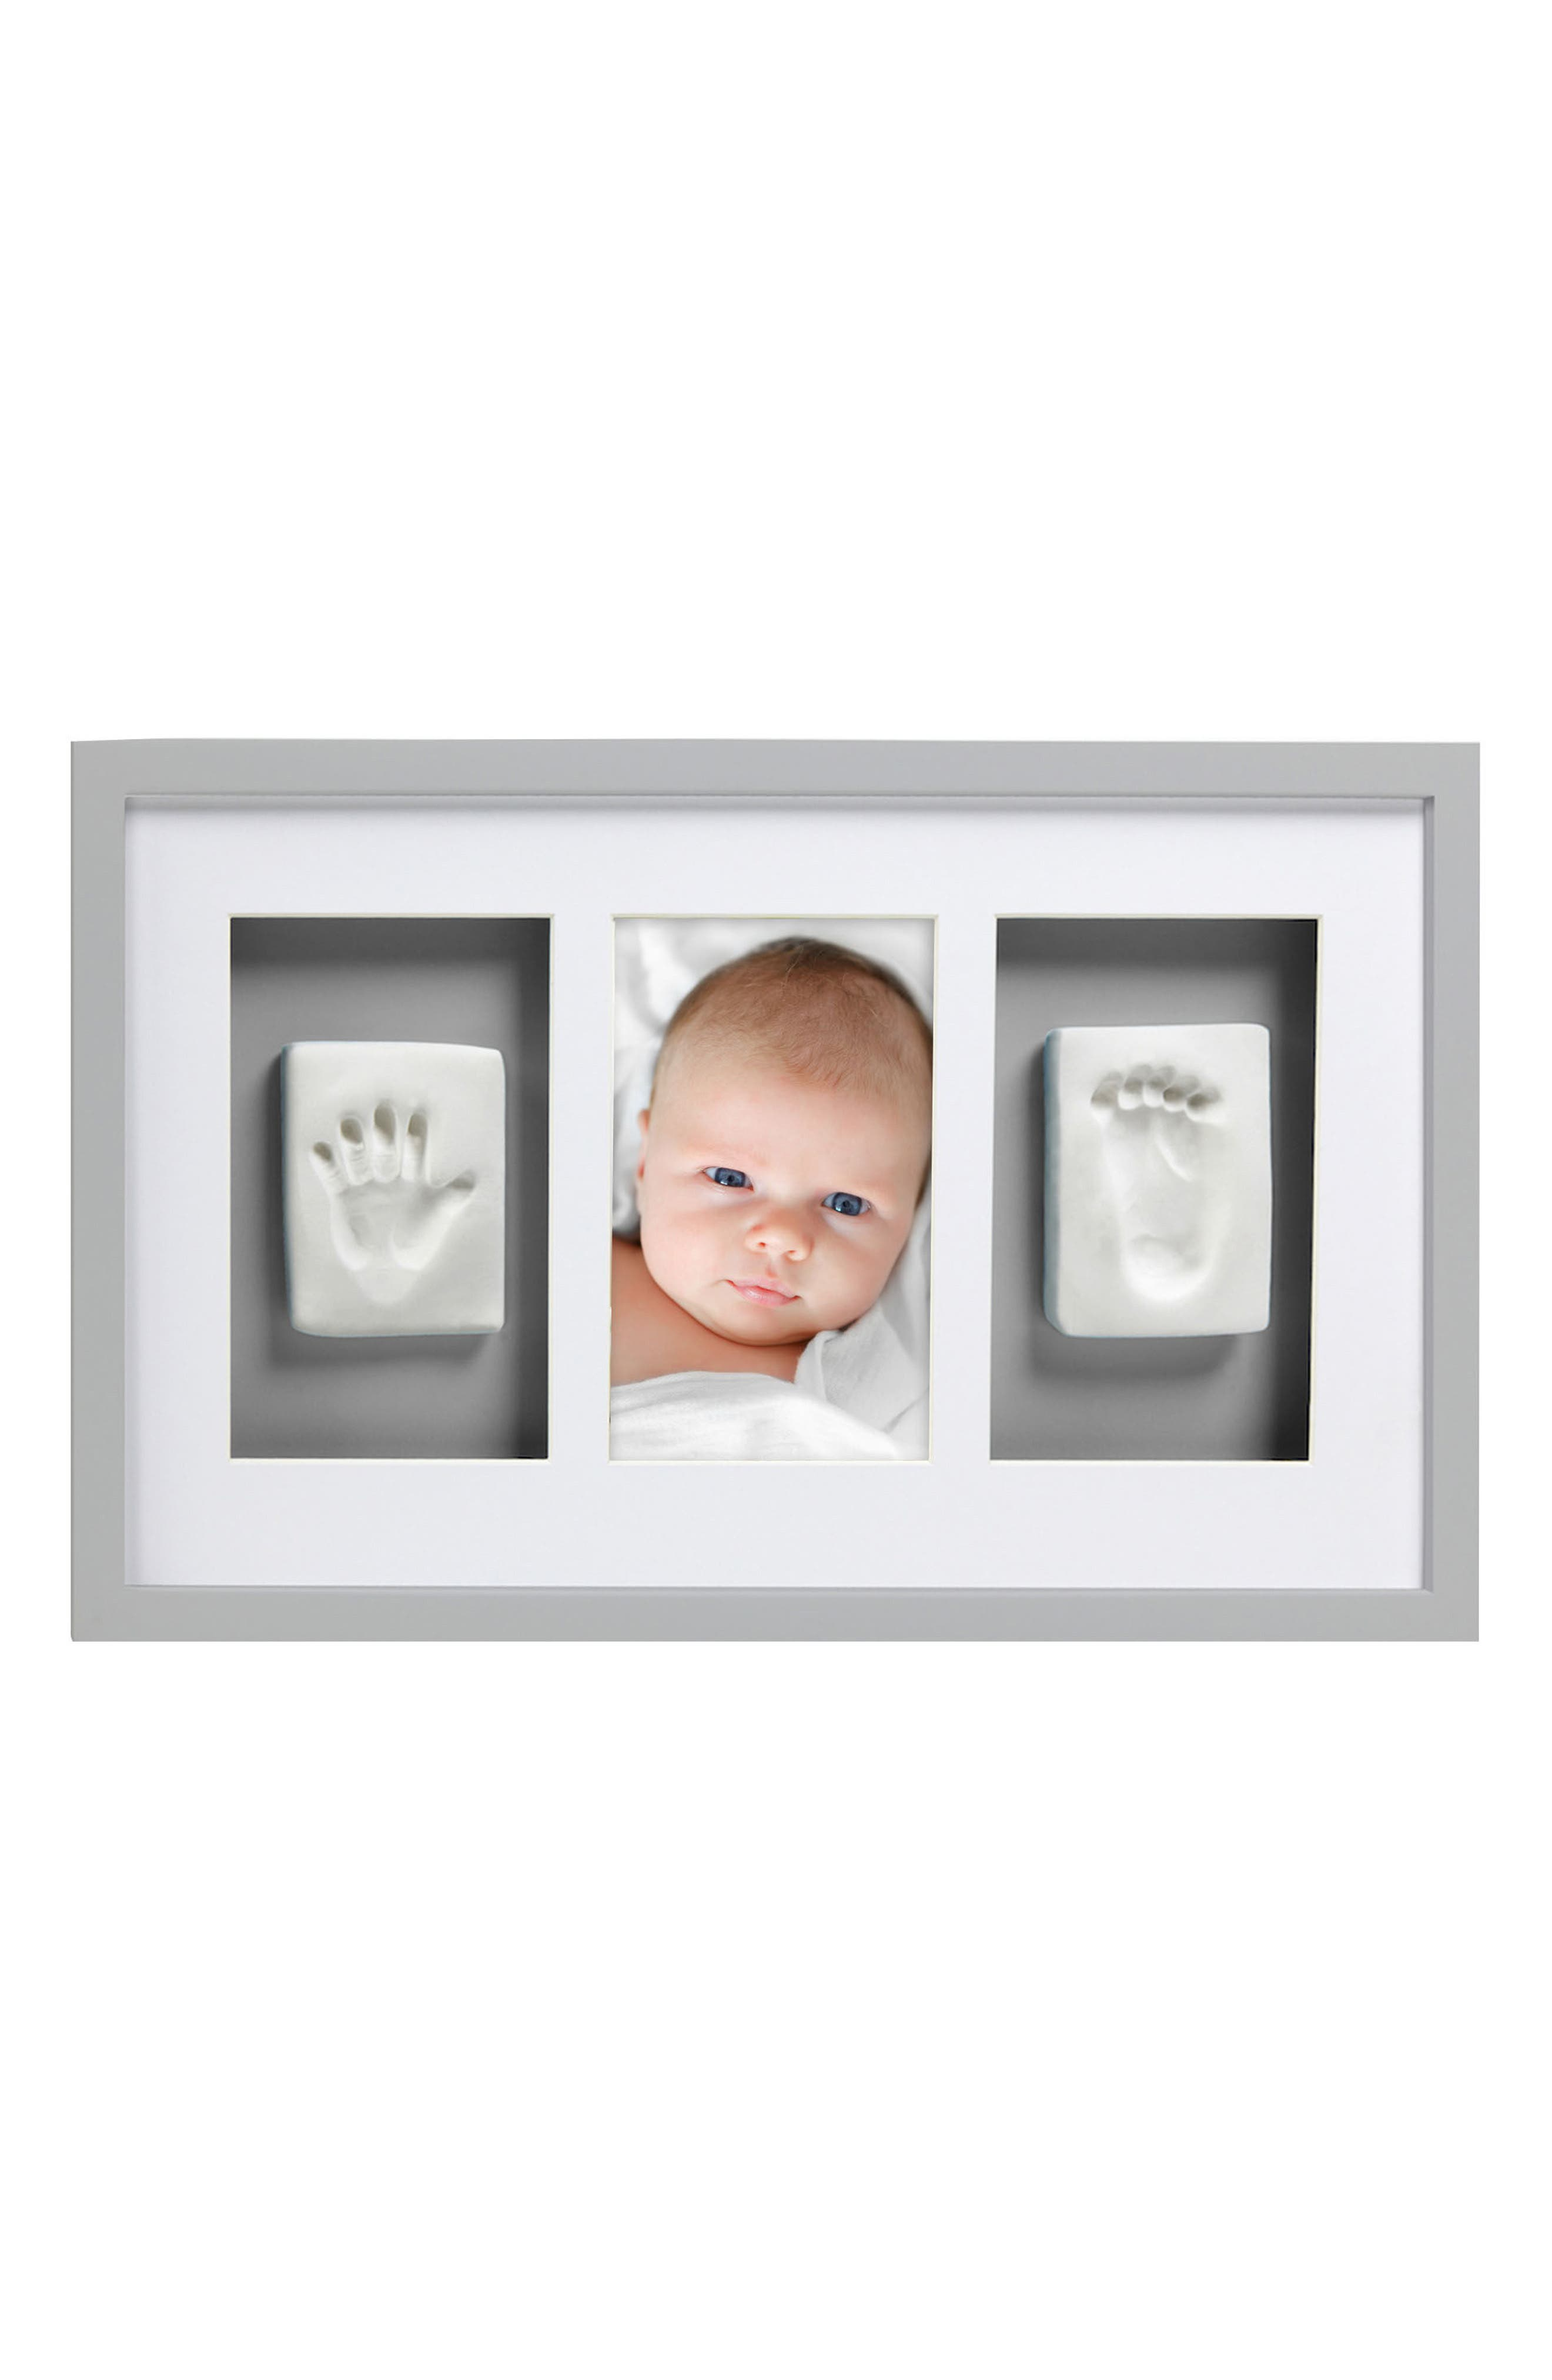 Babyprints Deluxe Wall Frame Kit,                             Main thumbnail 1, color,                             020